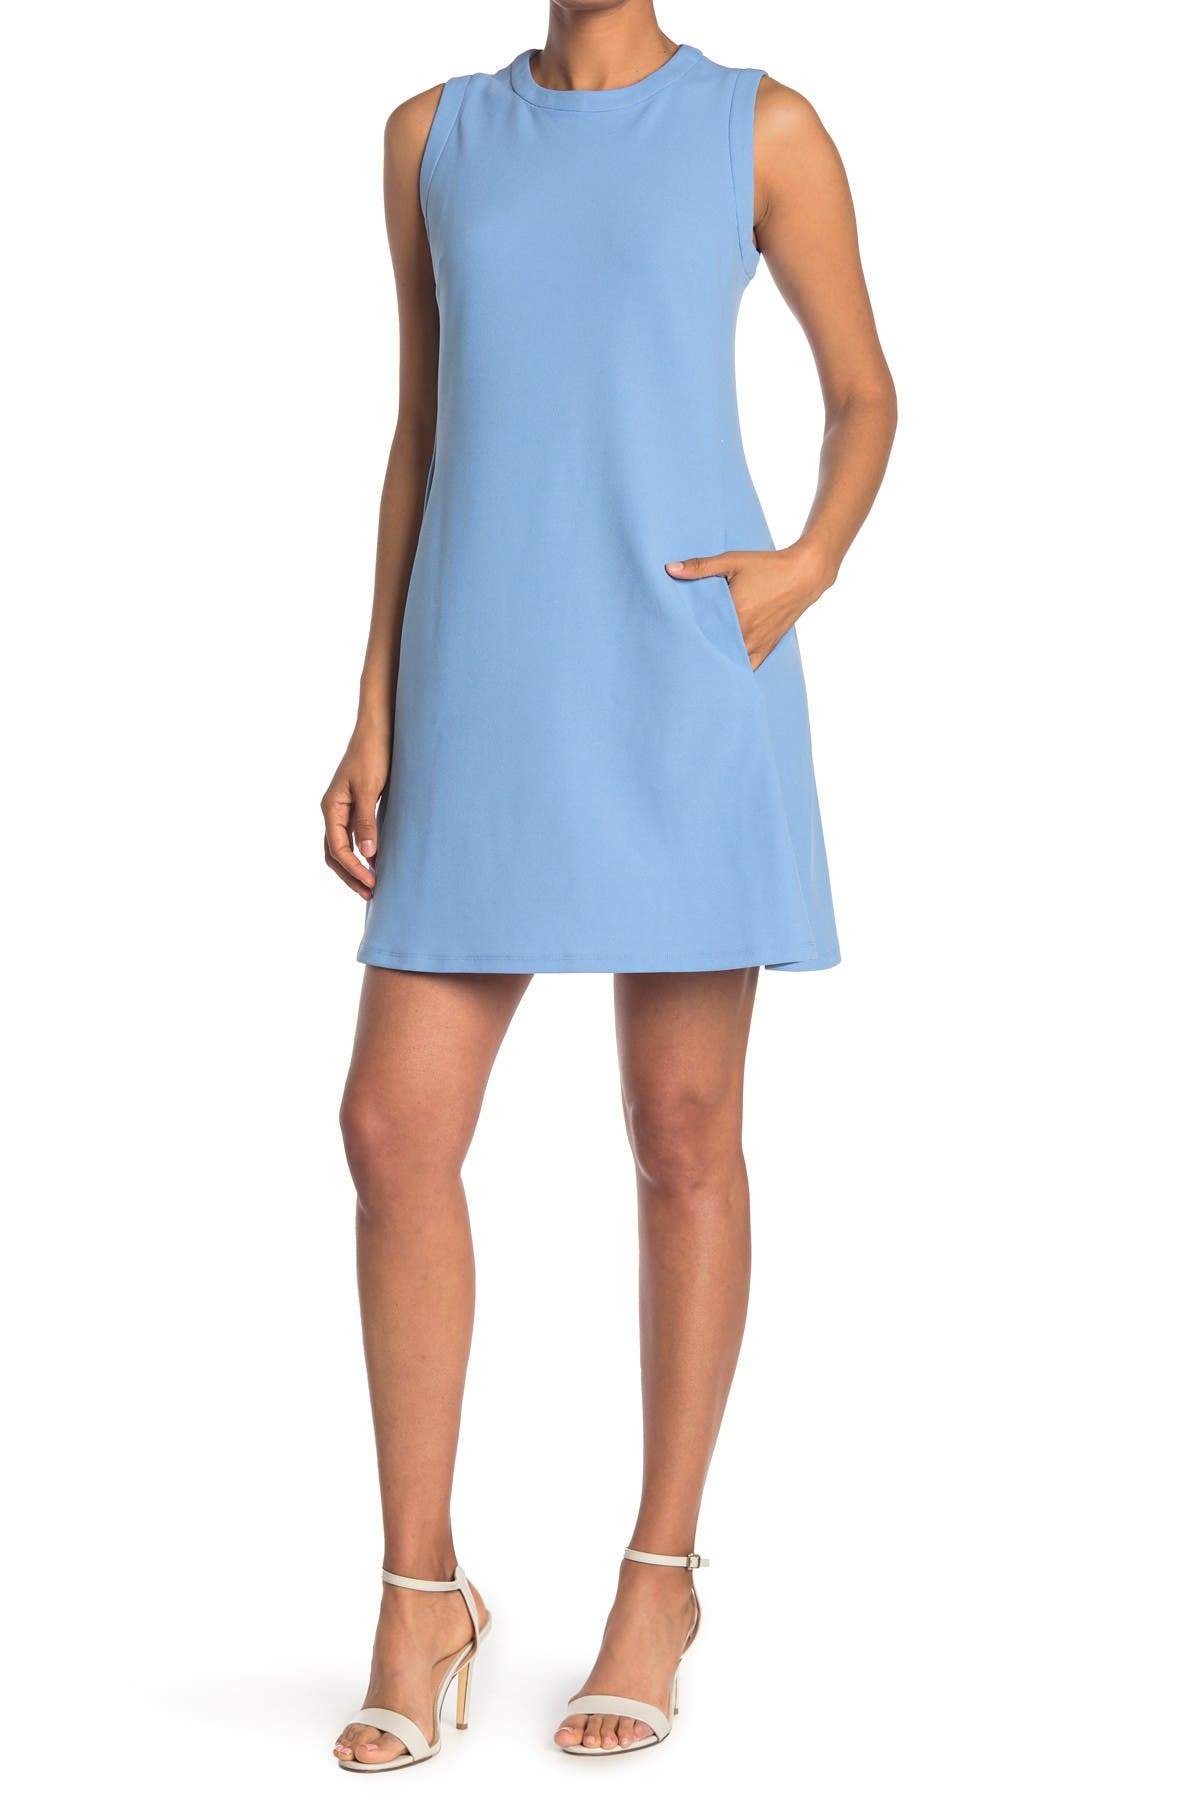 Image of Donna Morgan Jewel Neck Mini Shift Dress